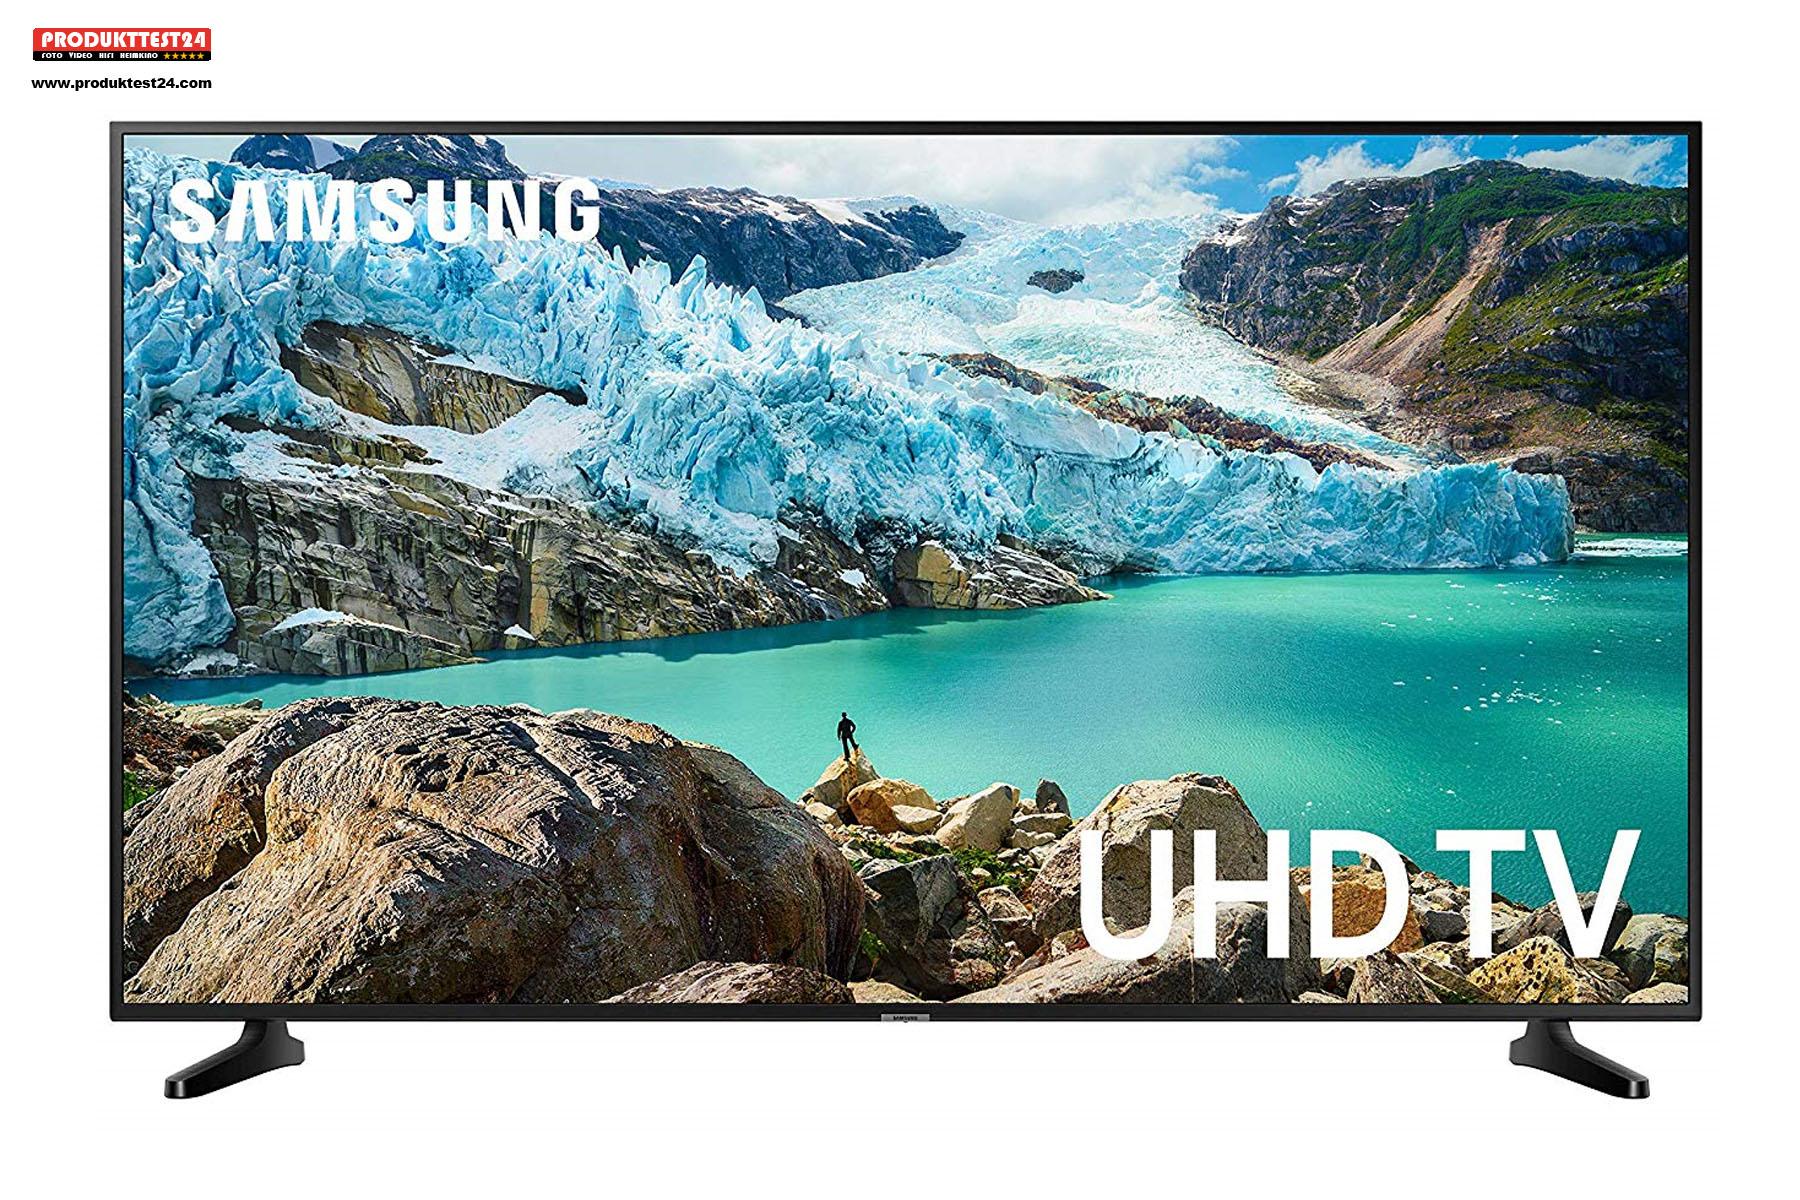 Samsung 65RU7099 Ultra HD 4K-Fernseher